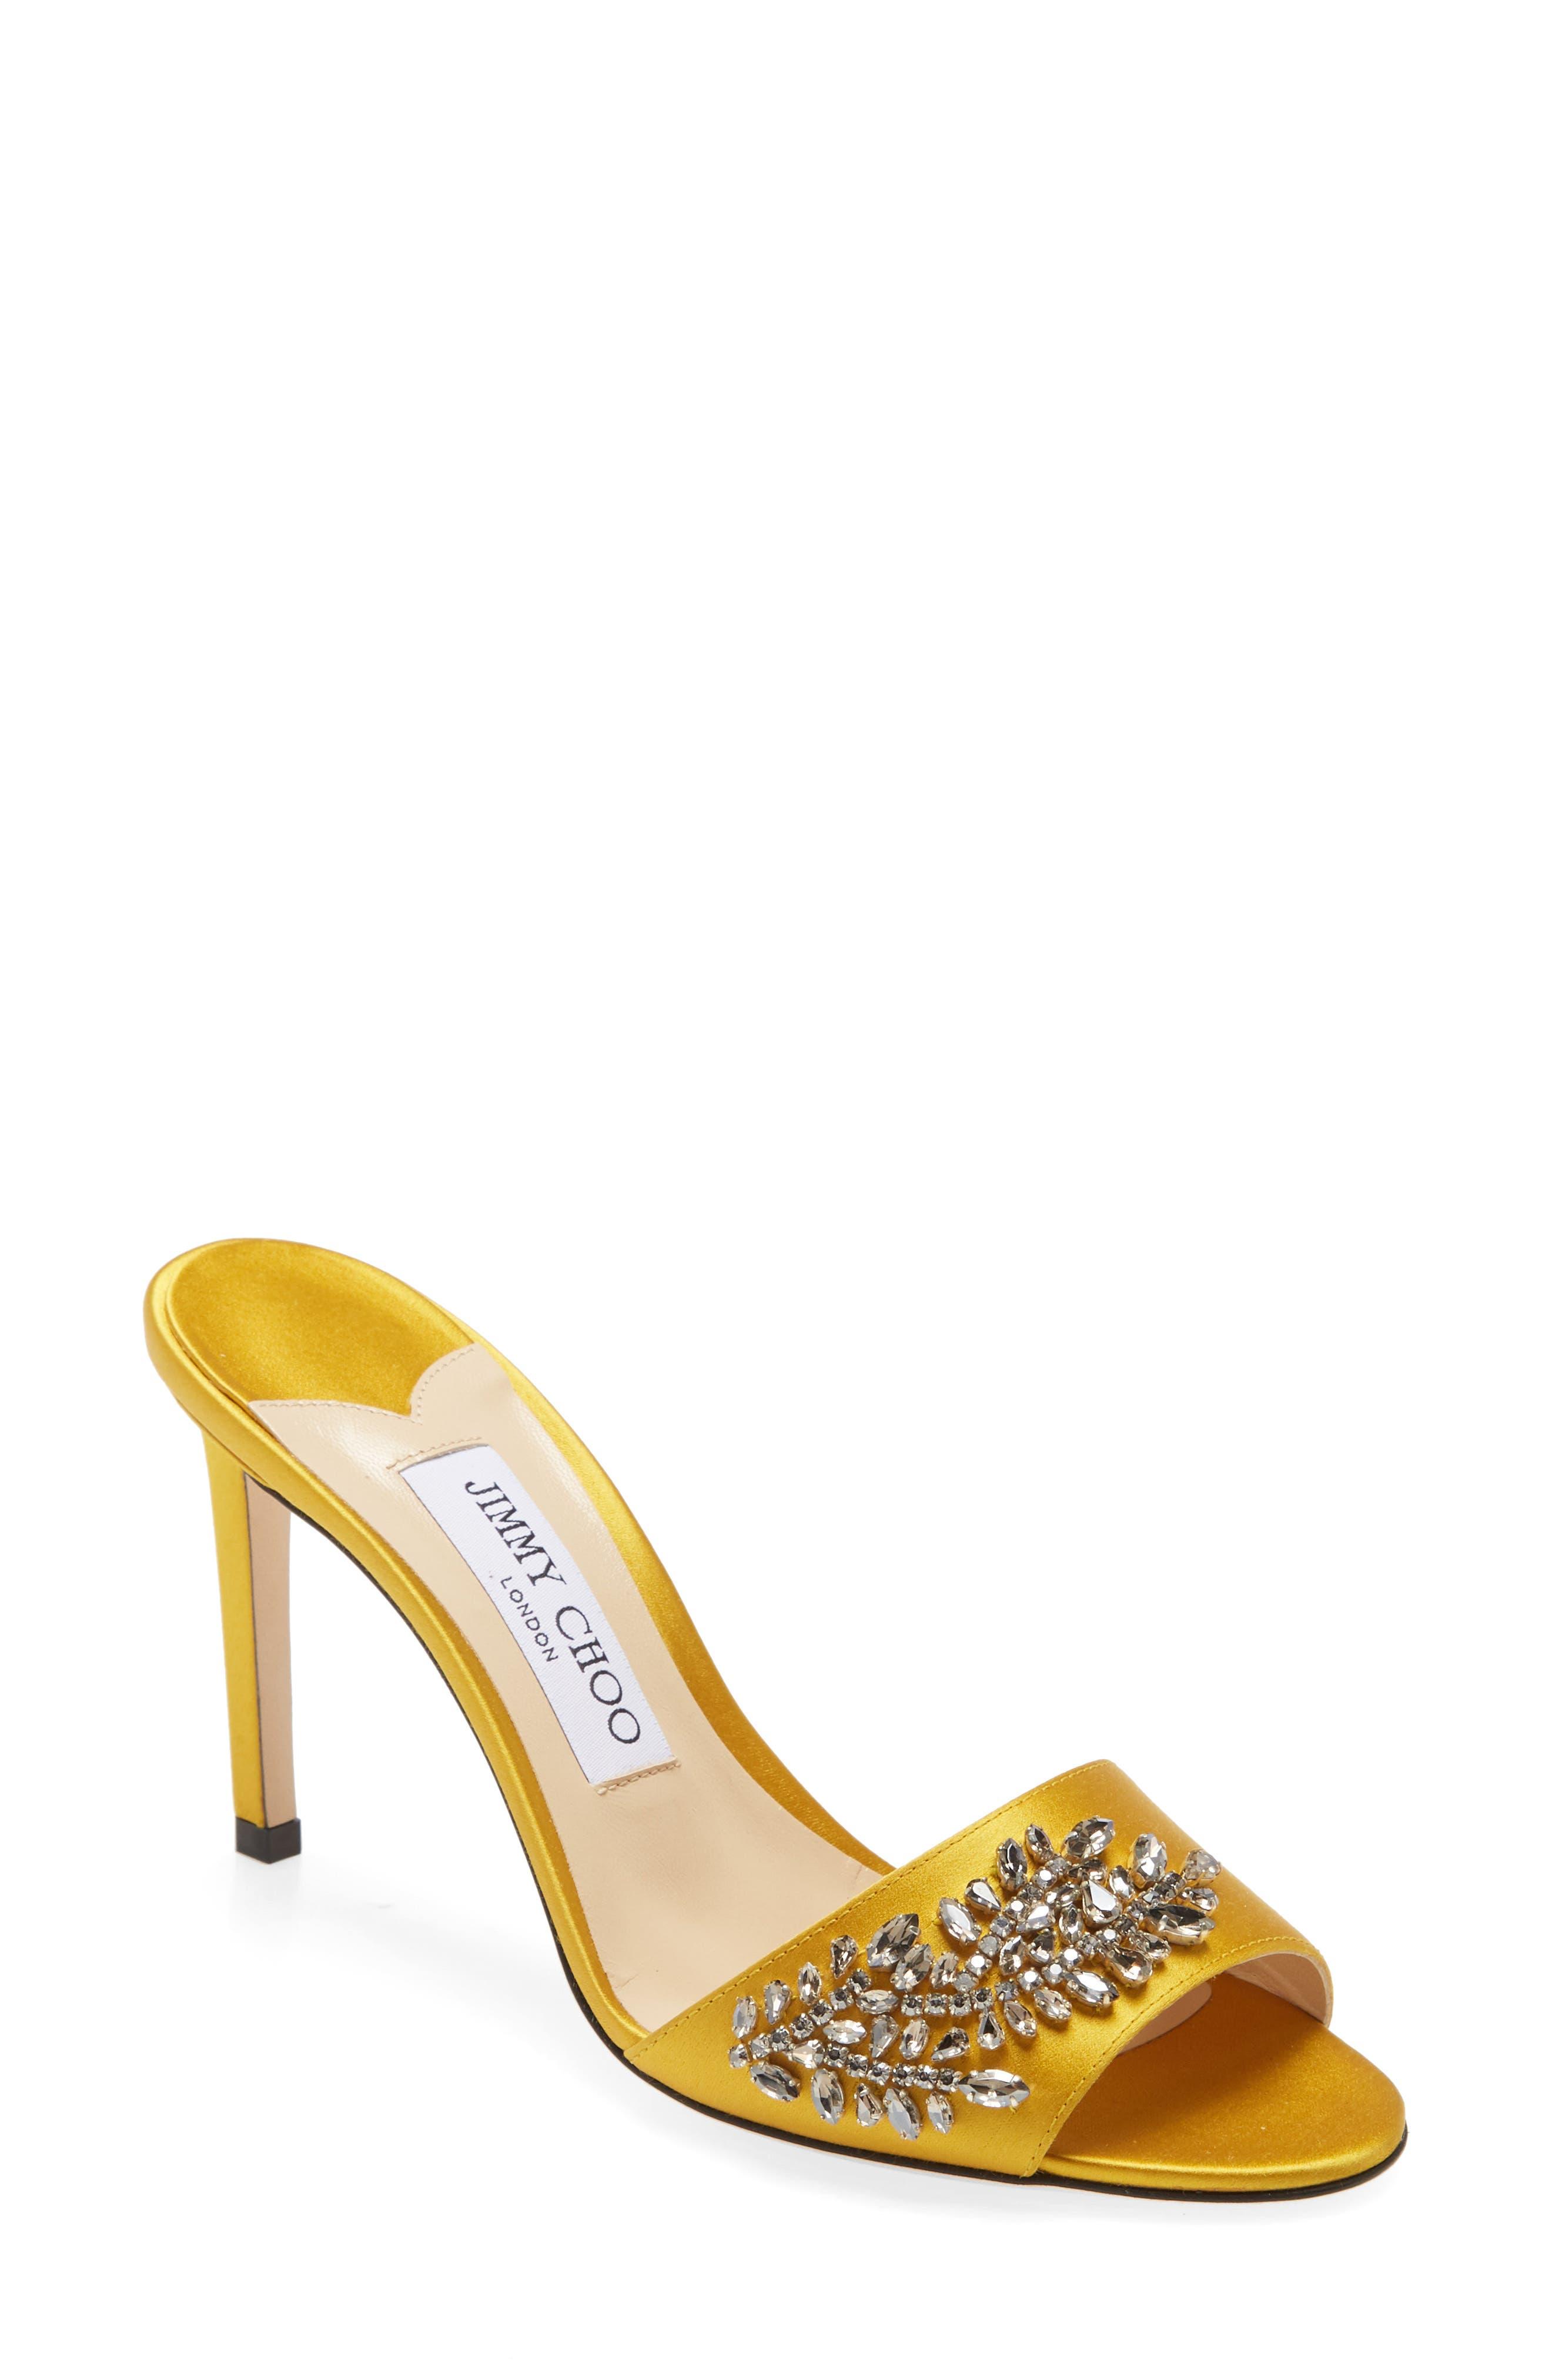 Designer Sandals for Women | Nordstrom